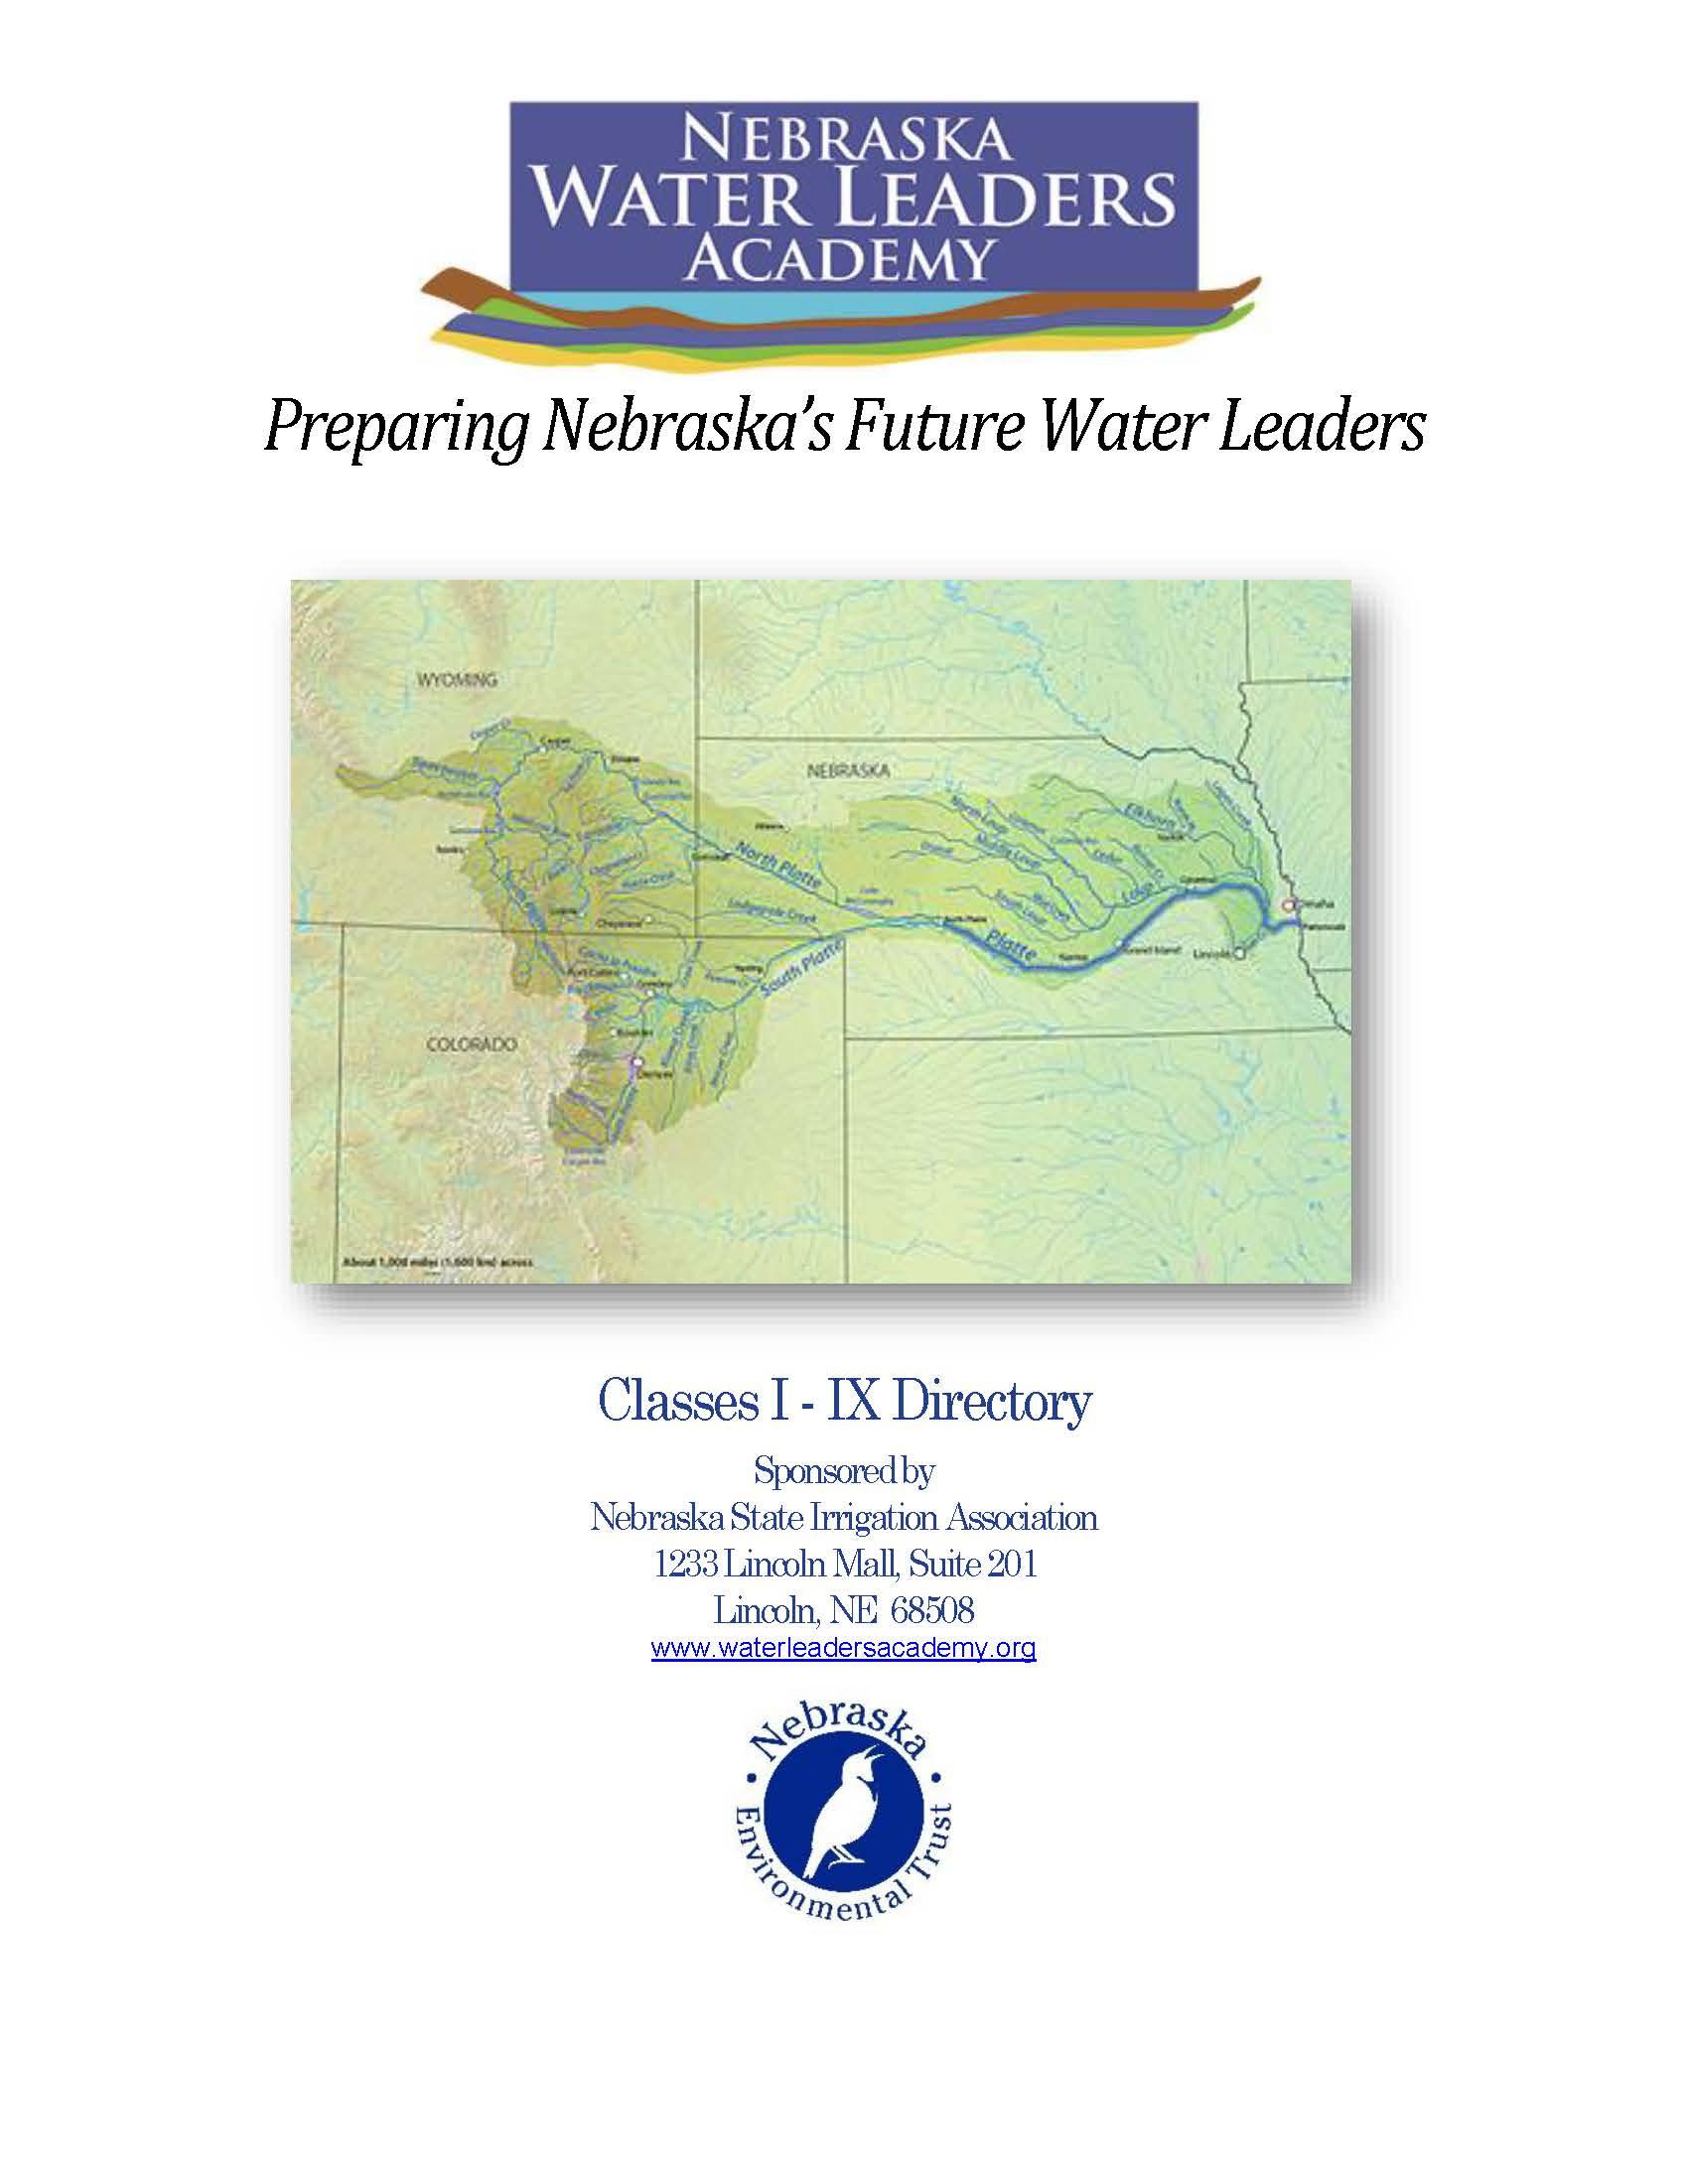 WLA Graduates - Nebraska Water Leaders Academy